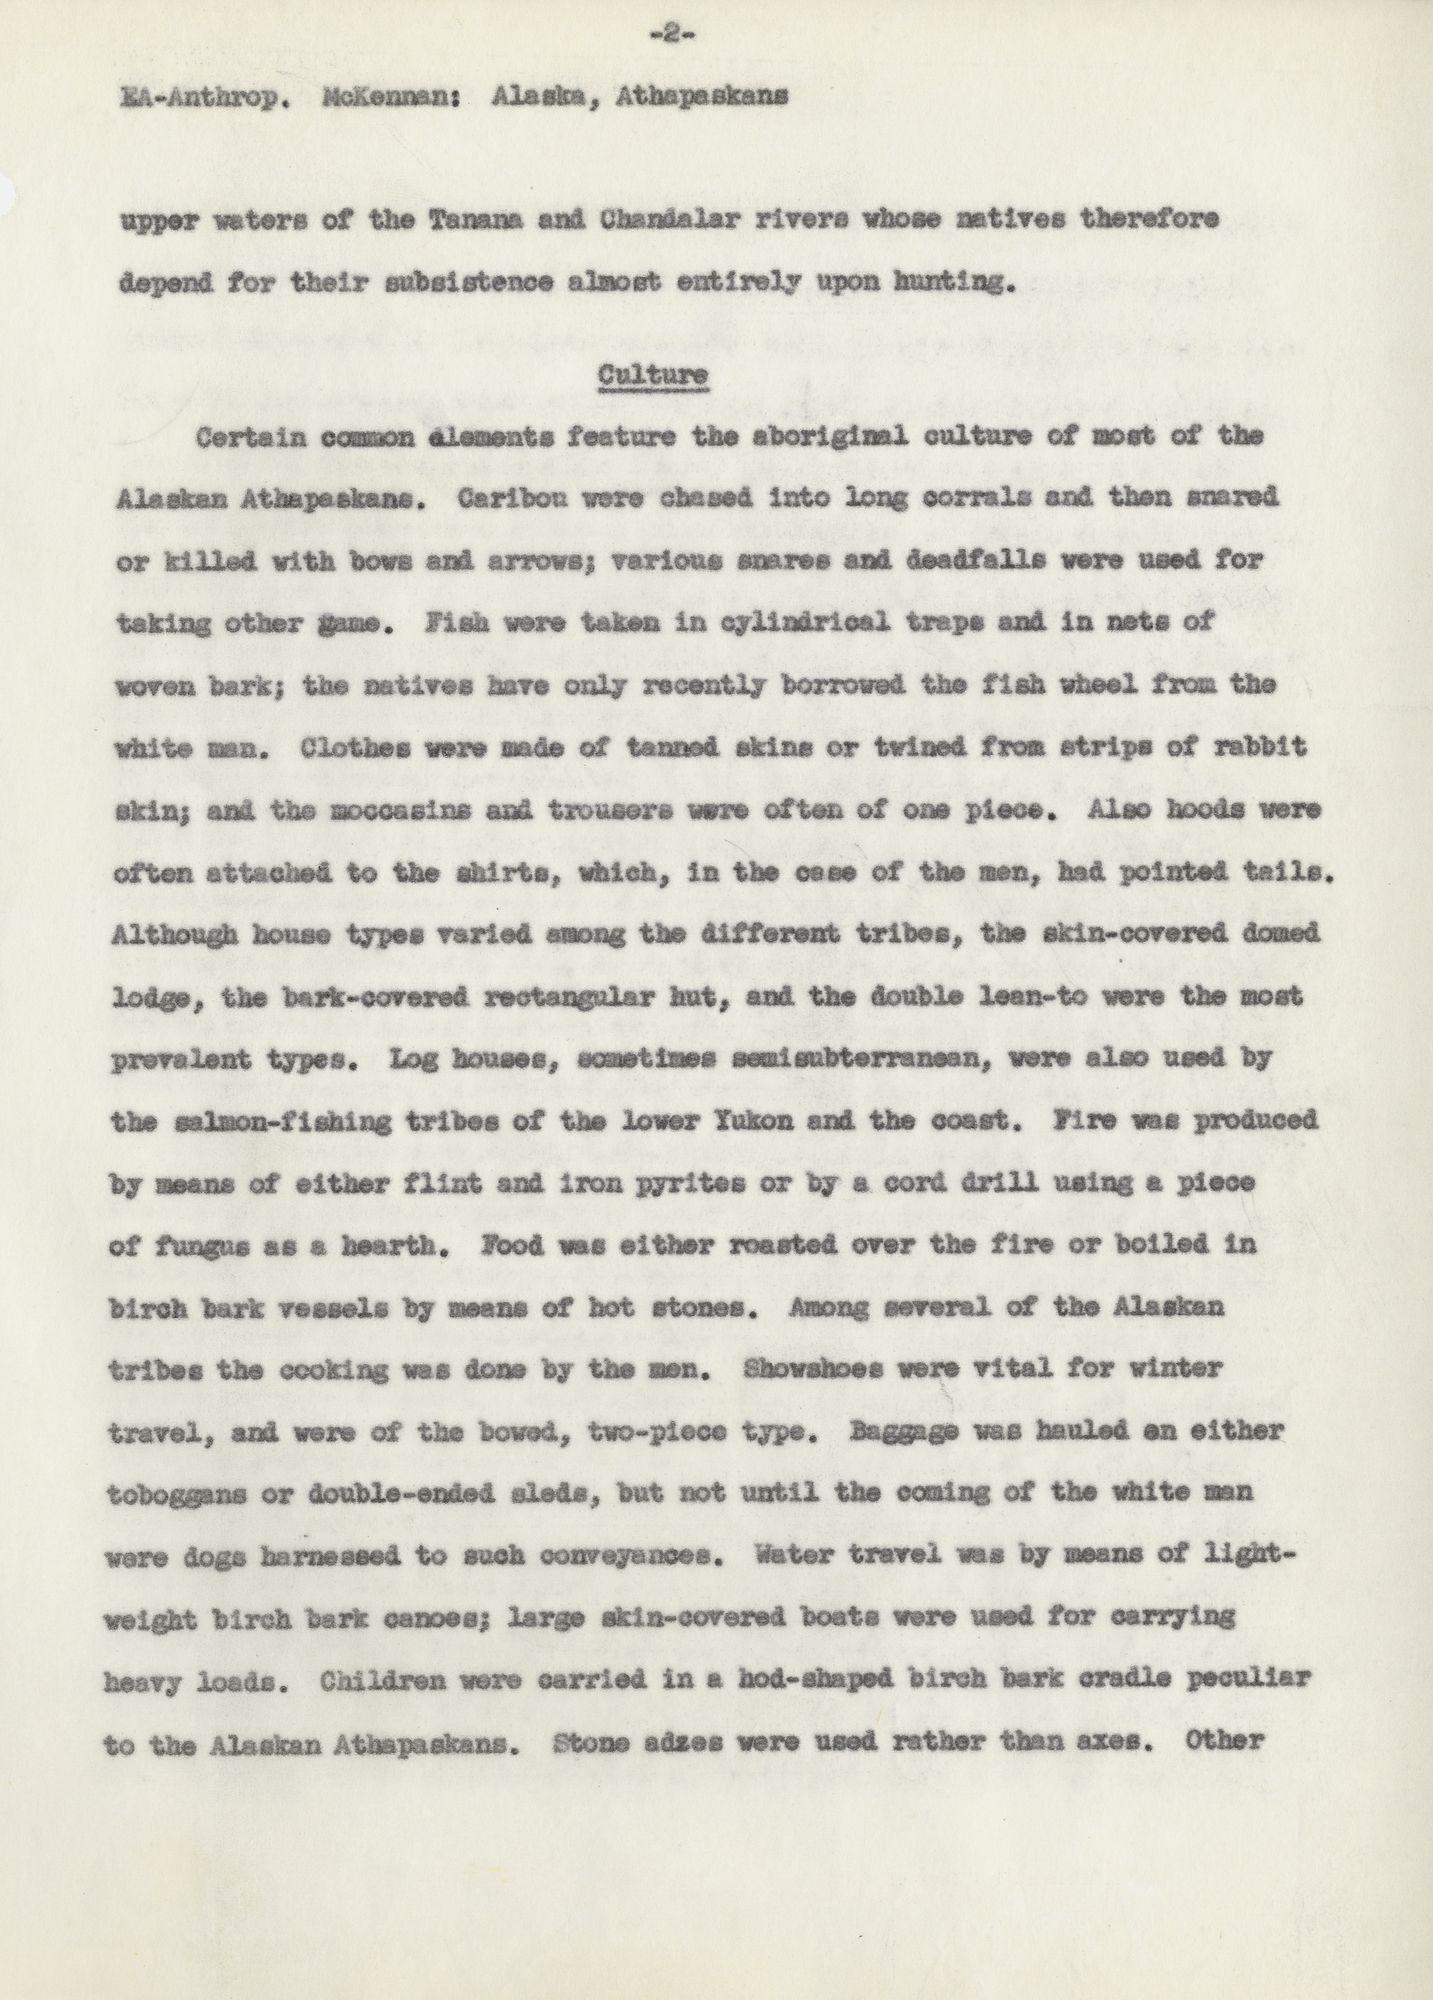 The Indians Encyclopedia Arctica 8  Anthropology and Archeology 1ae57e2080e6